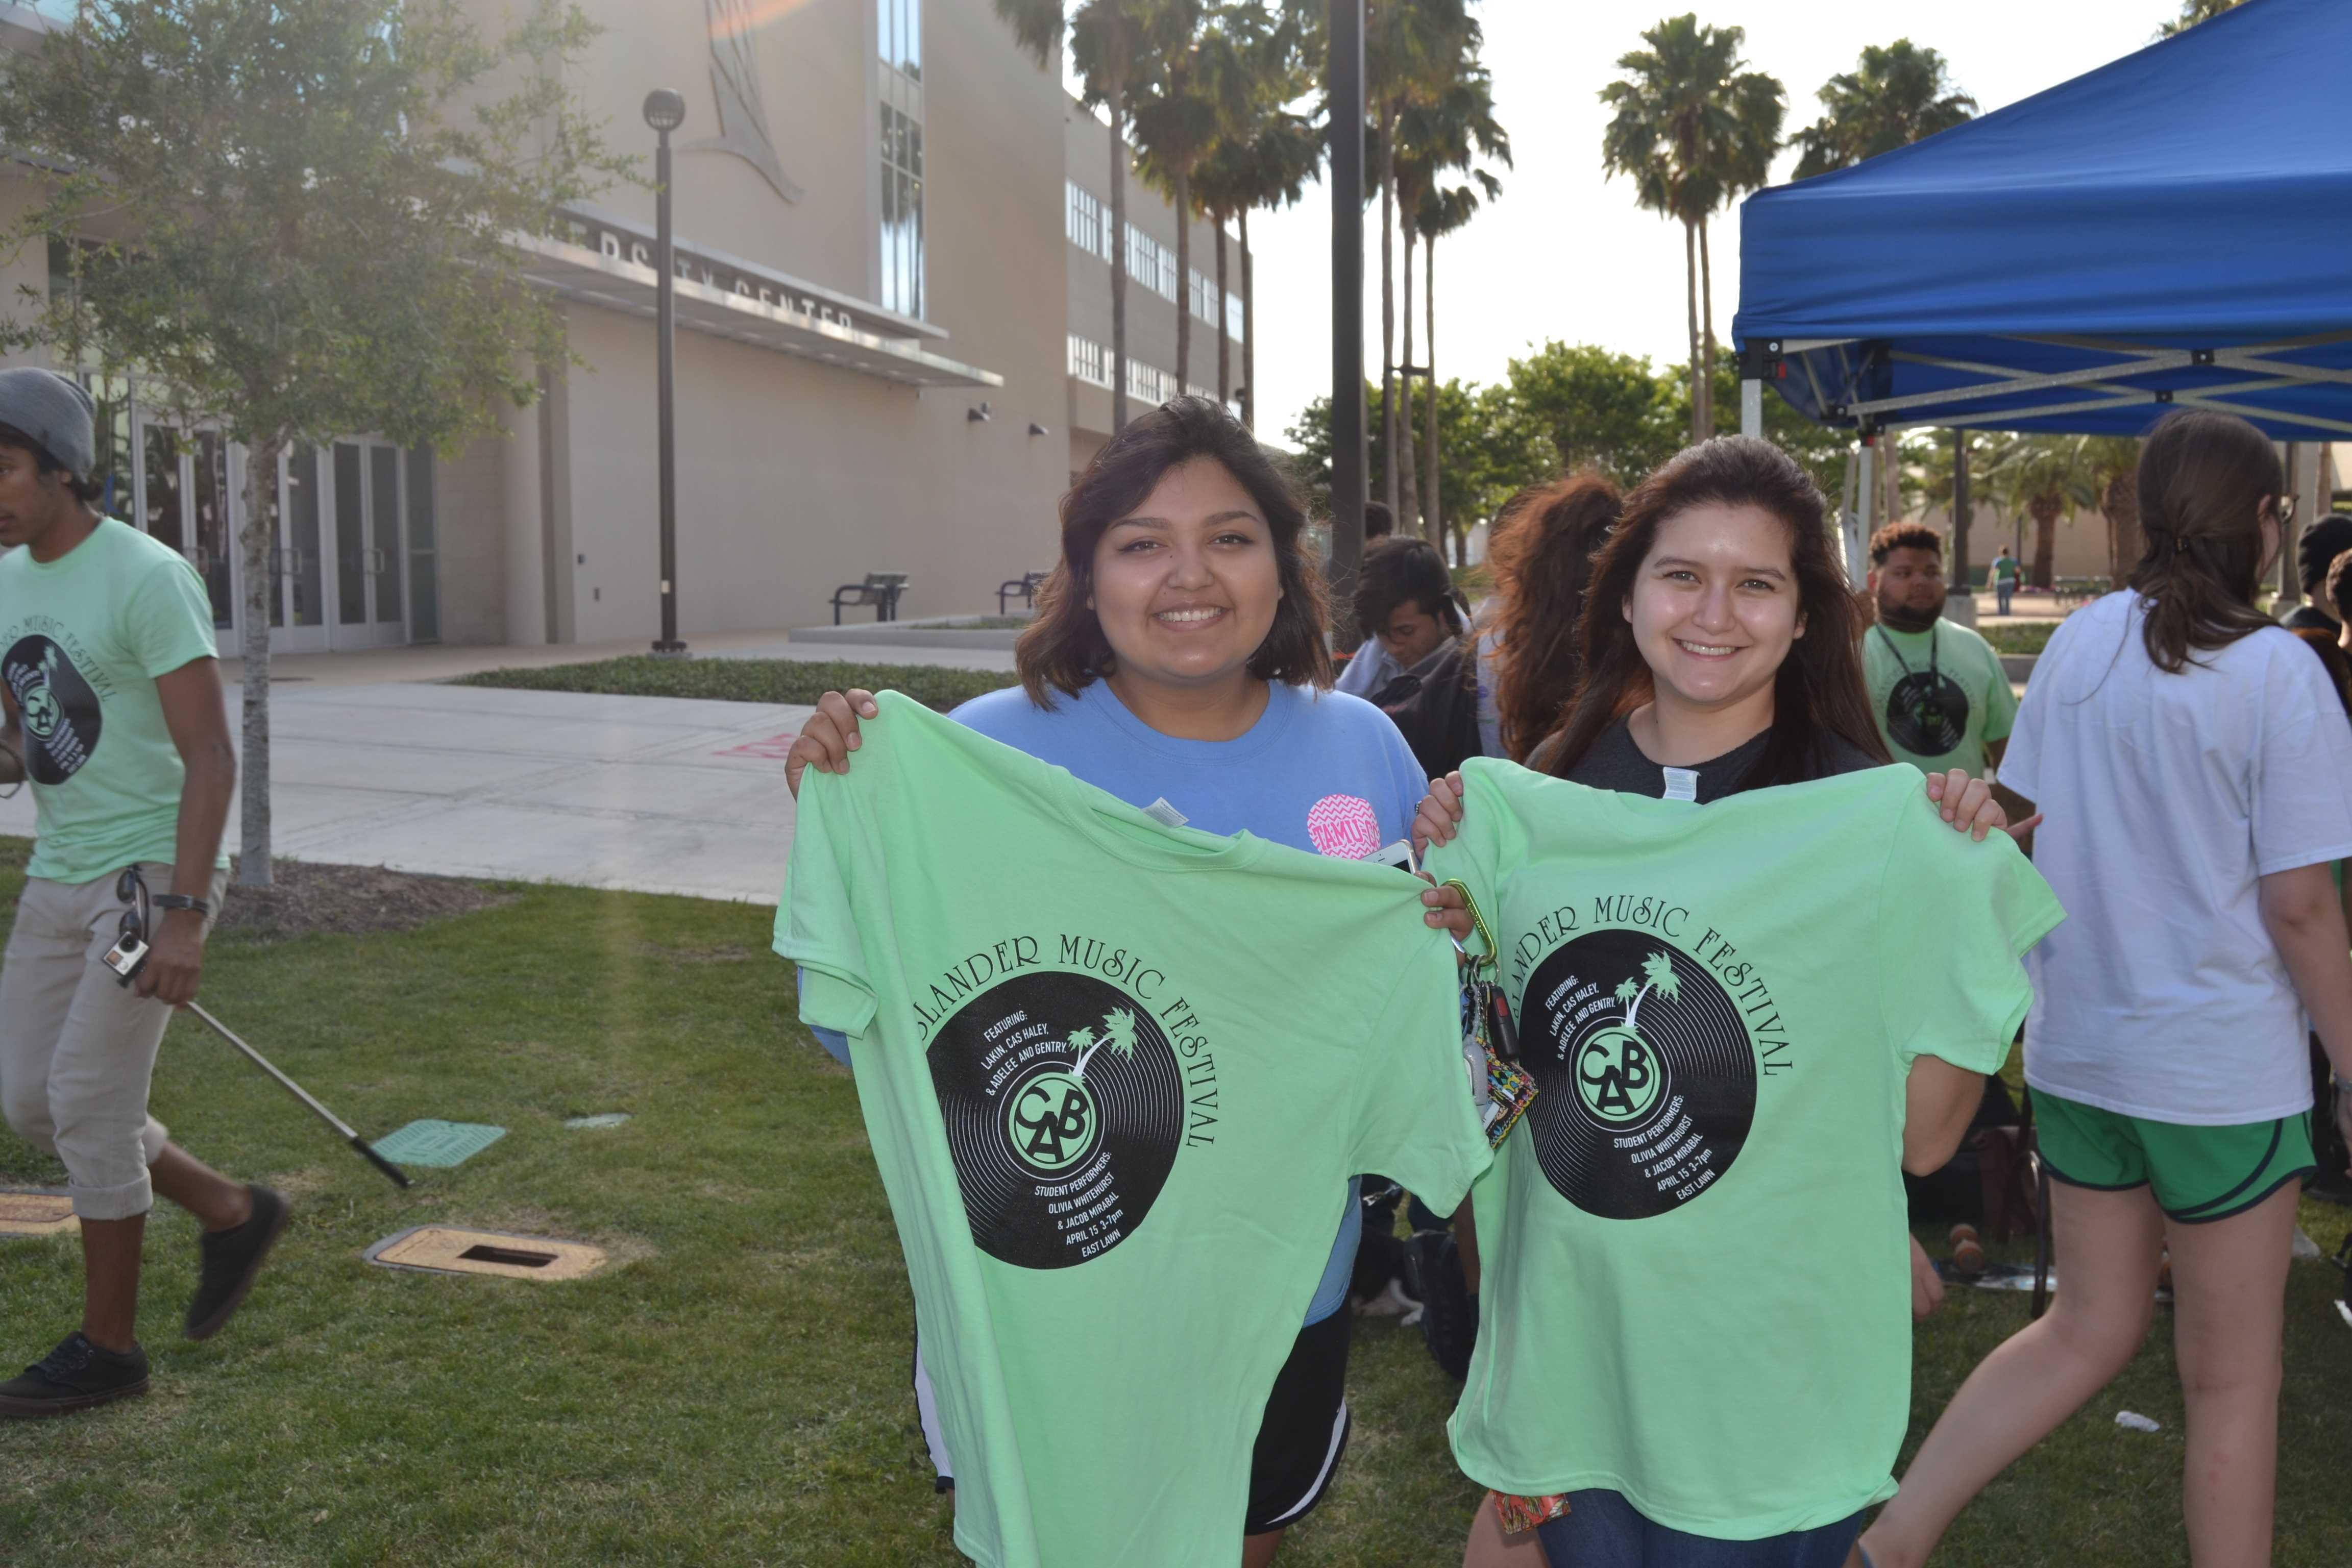 University hosts music festival for students